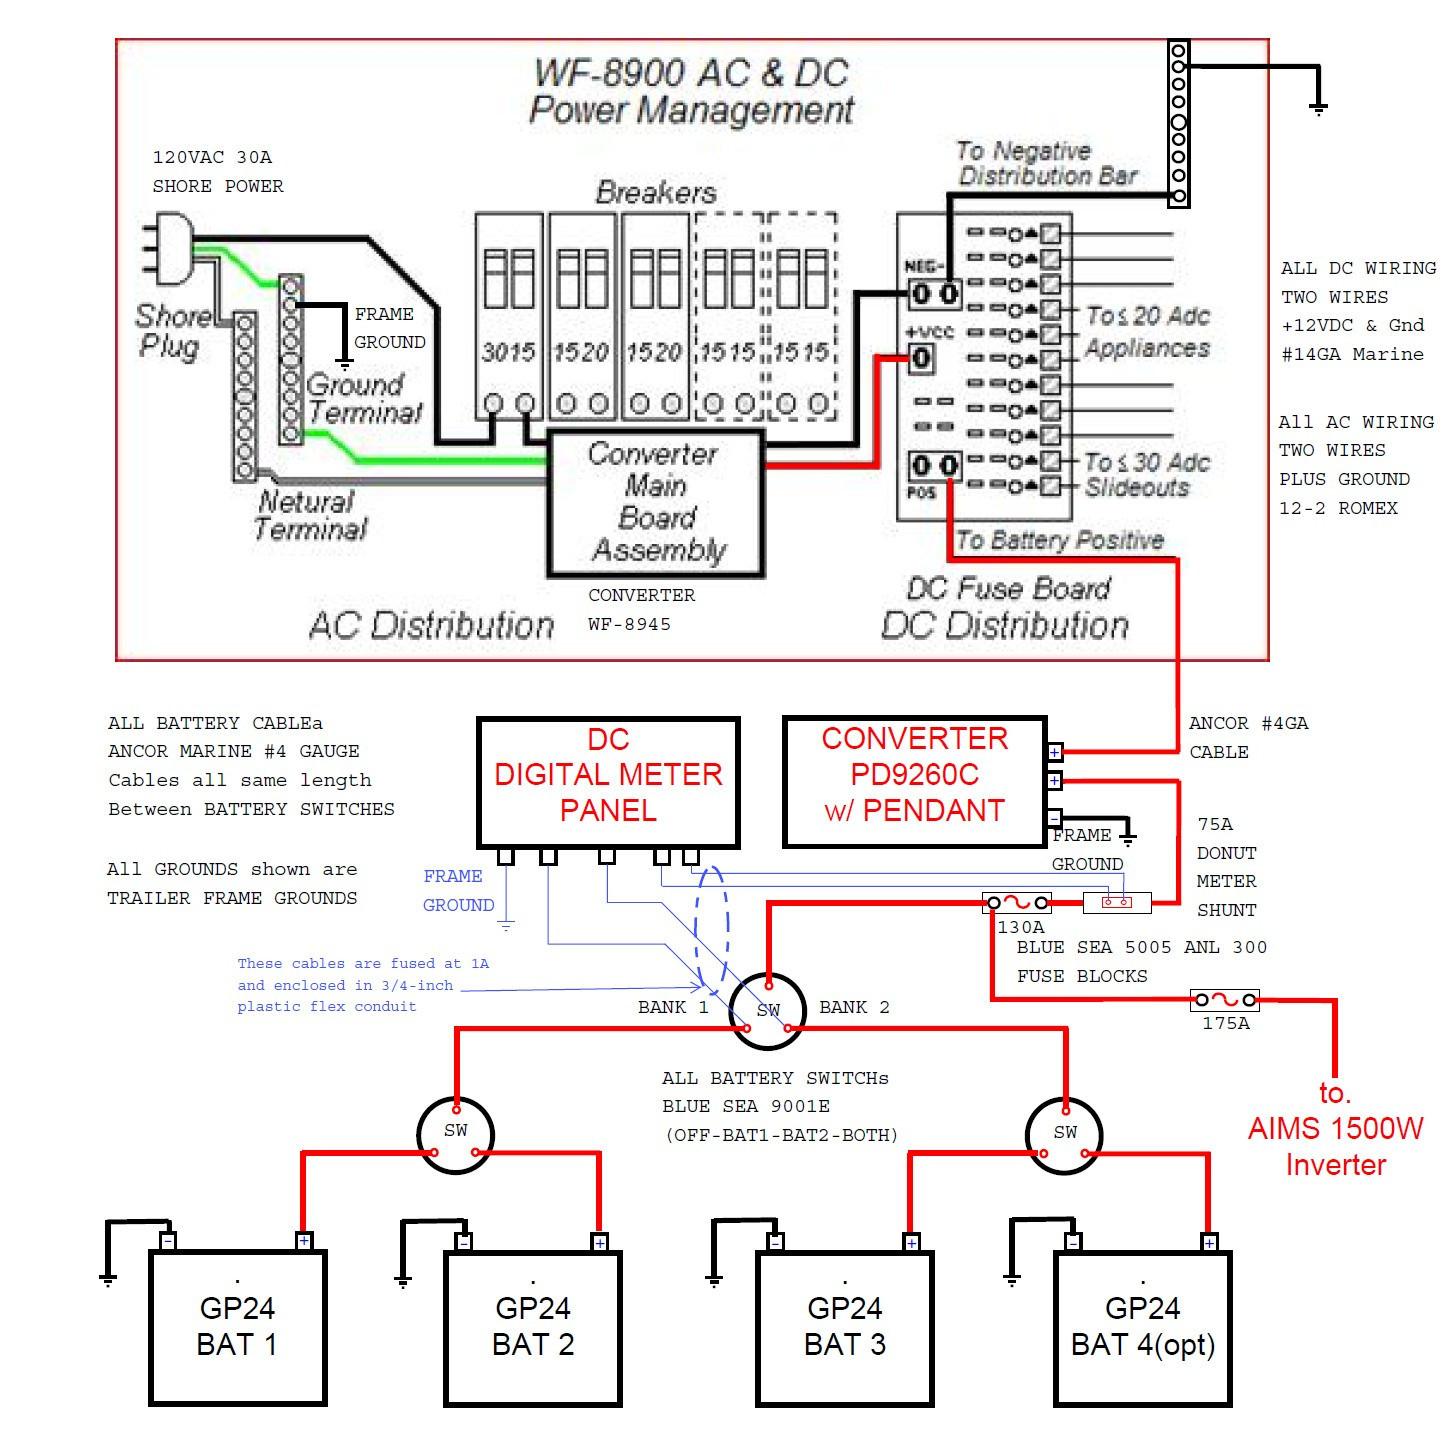 hight resolution of 30a 250v plug wiring diagram free downloads 30a 250v plug wiring 20a 250v plug wiring